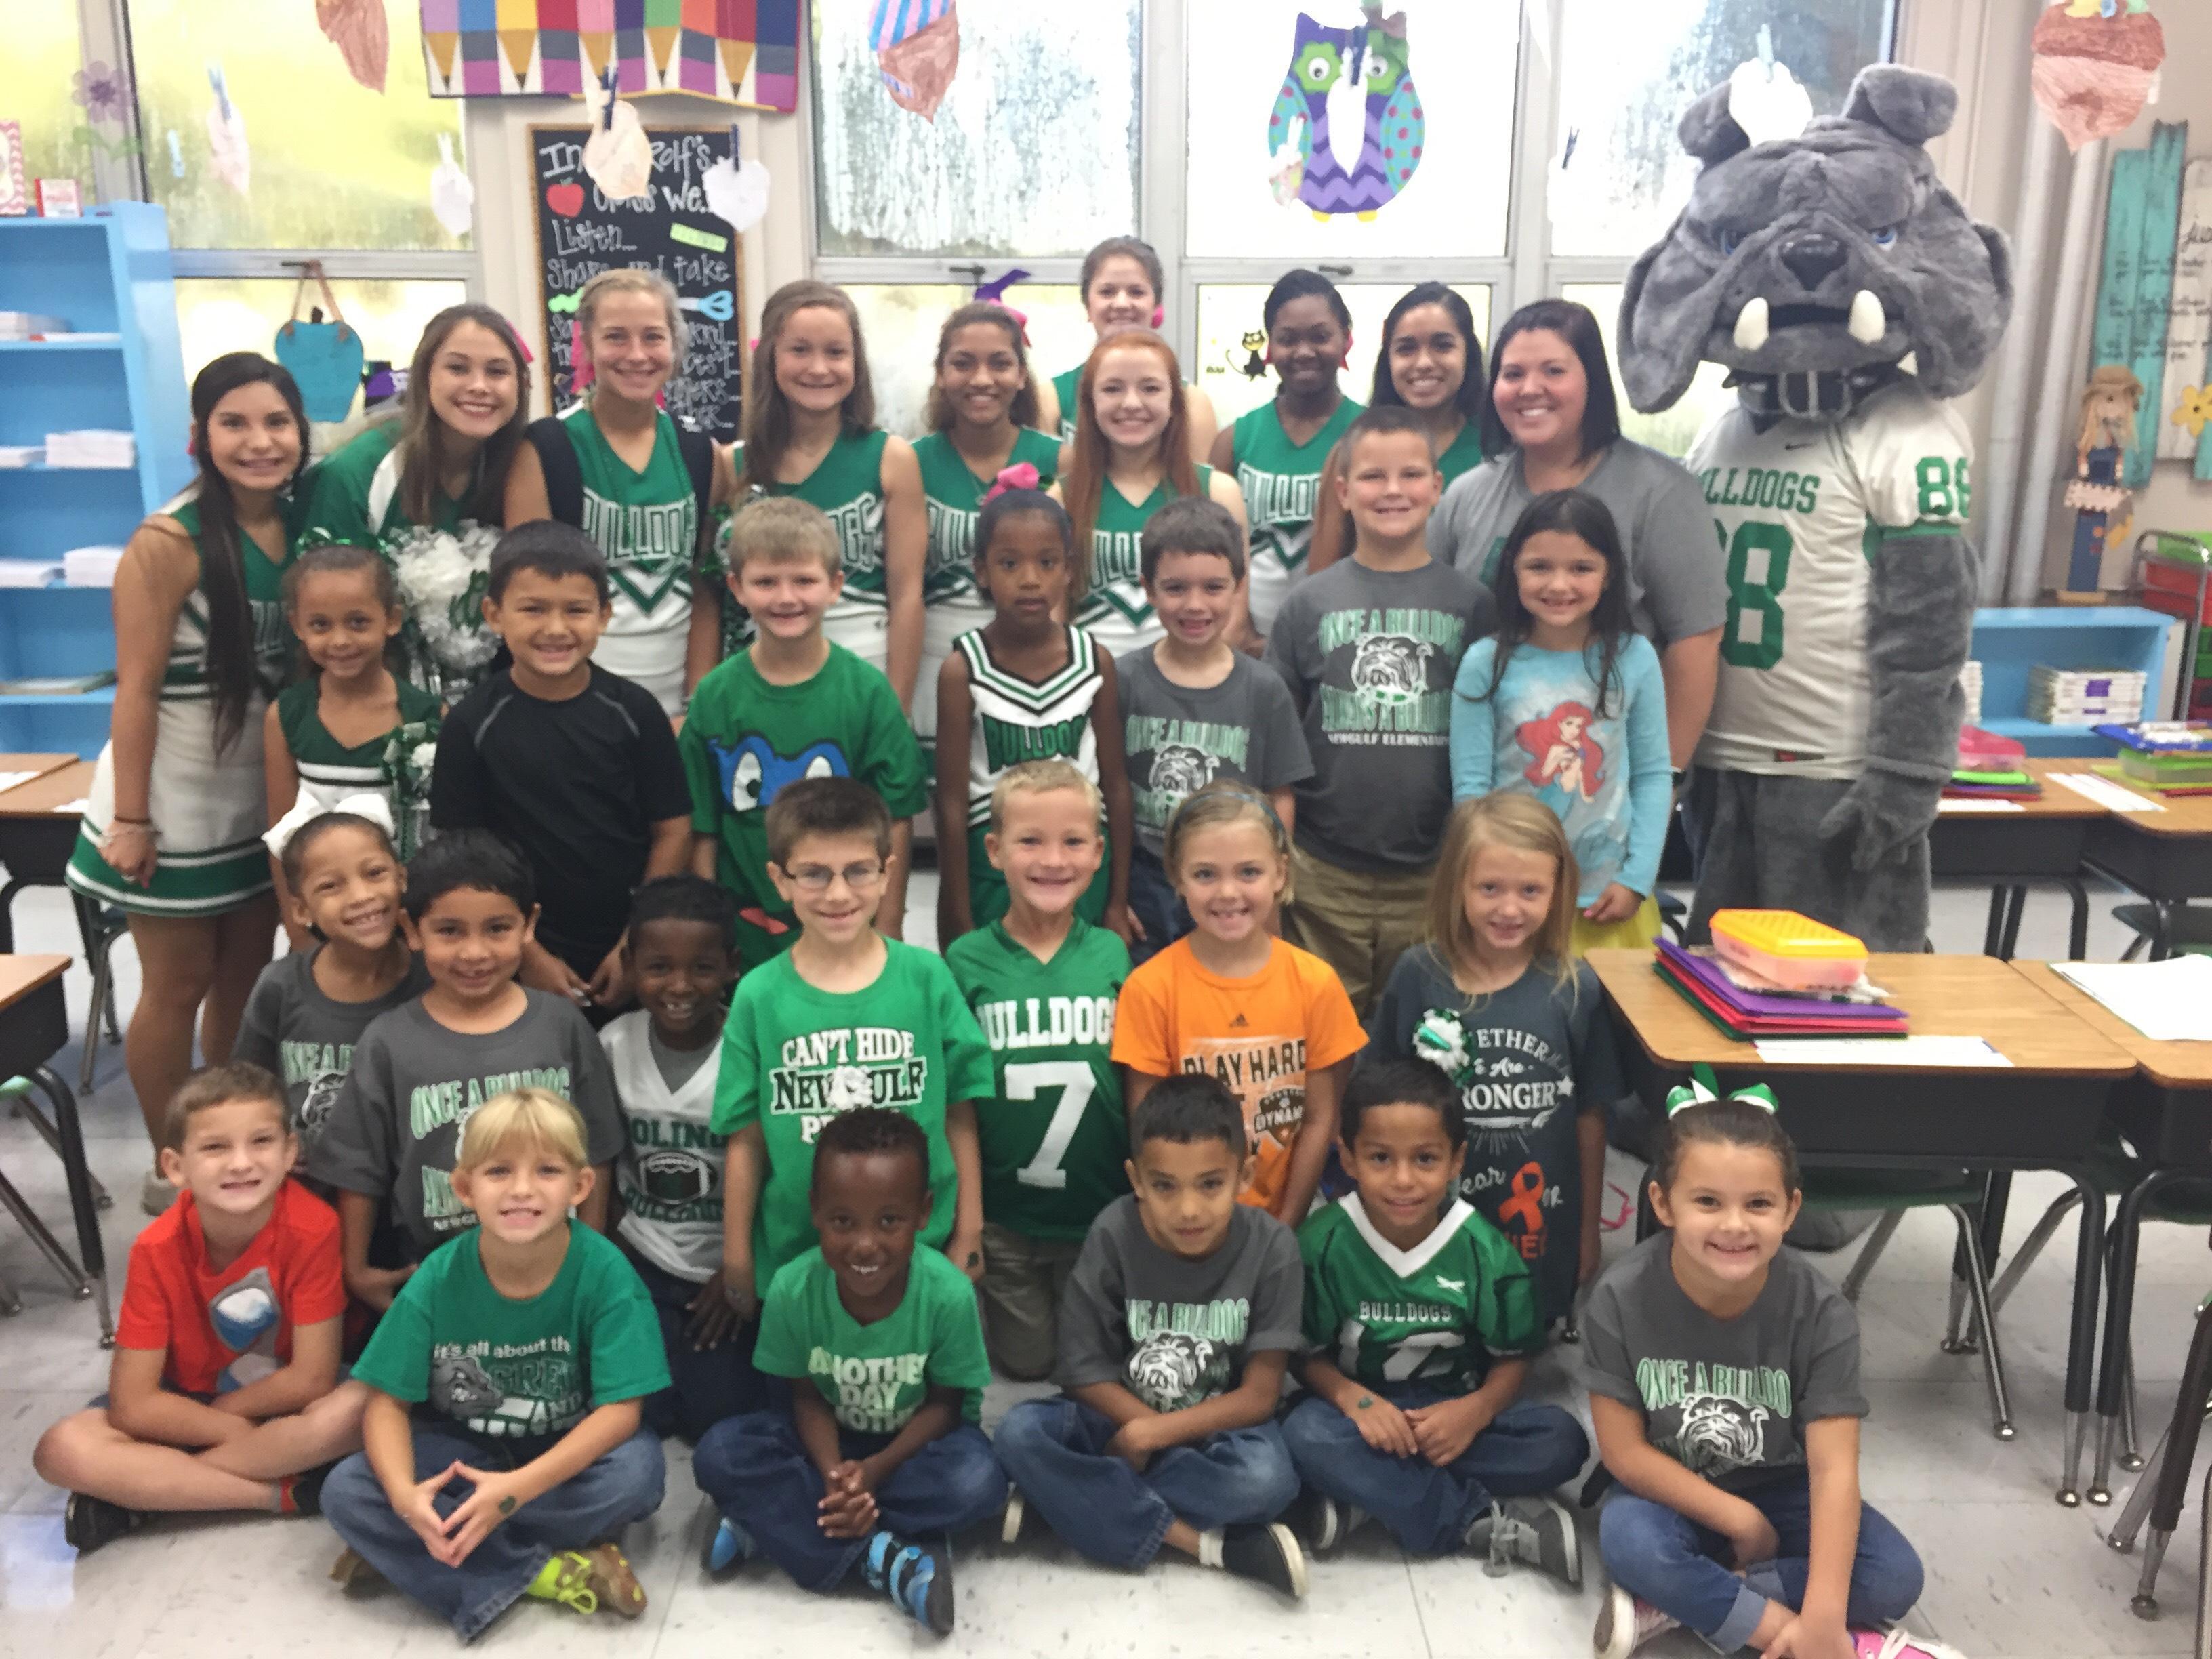 children with cheerleaders and mascot